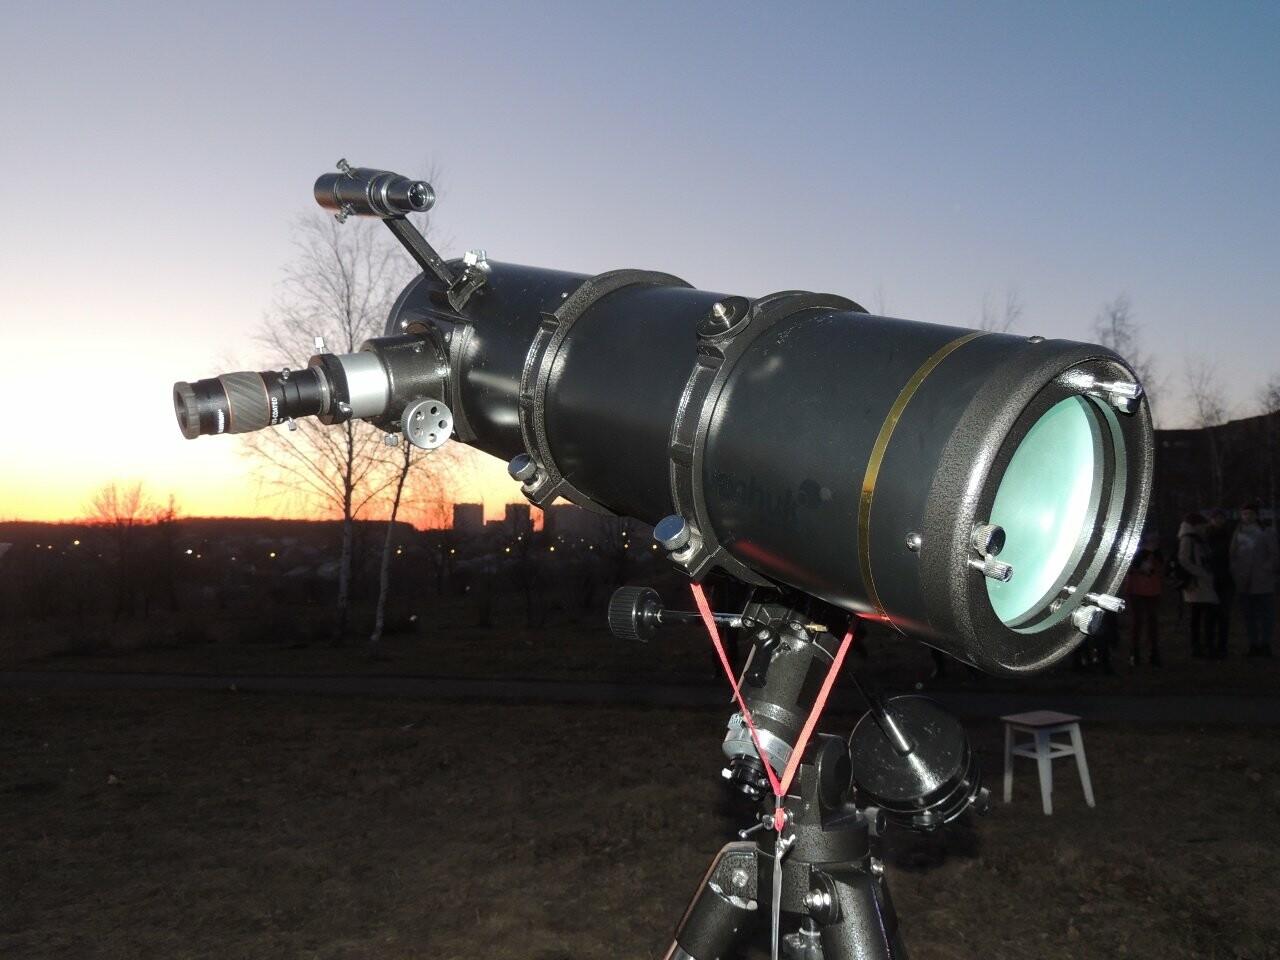 Тамбовчане отметили День космонавтики вместе с порталом Go68 и «Радио Дача», фото-2